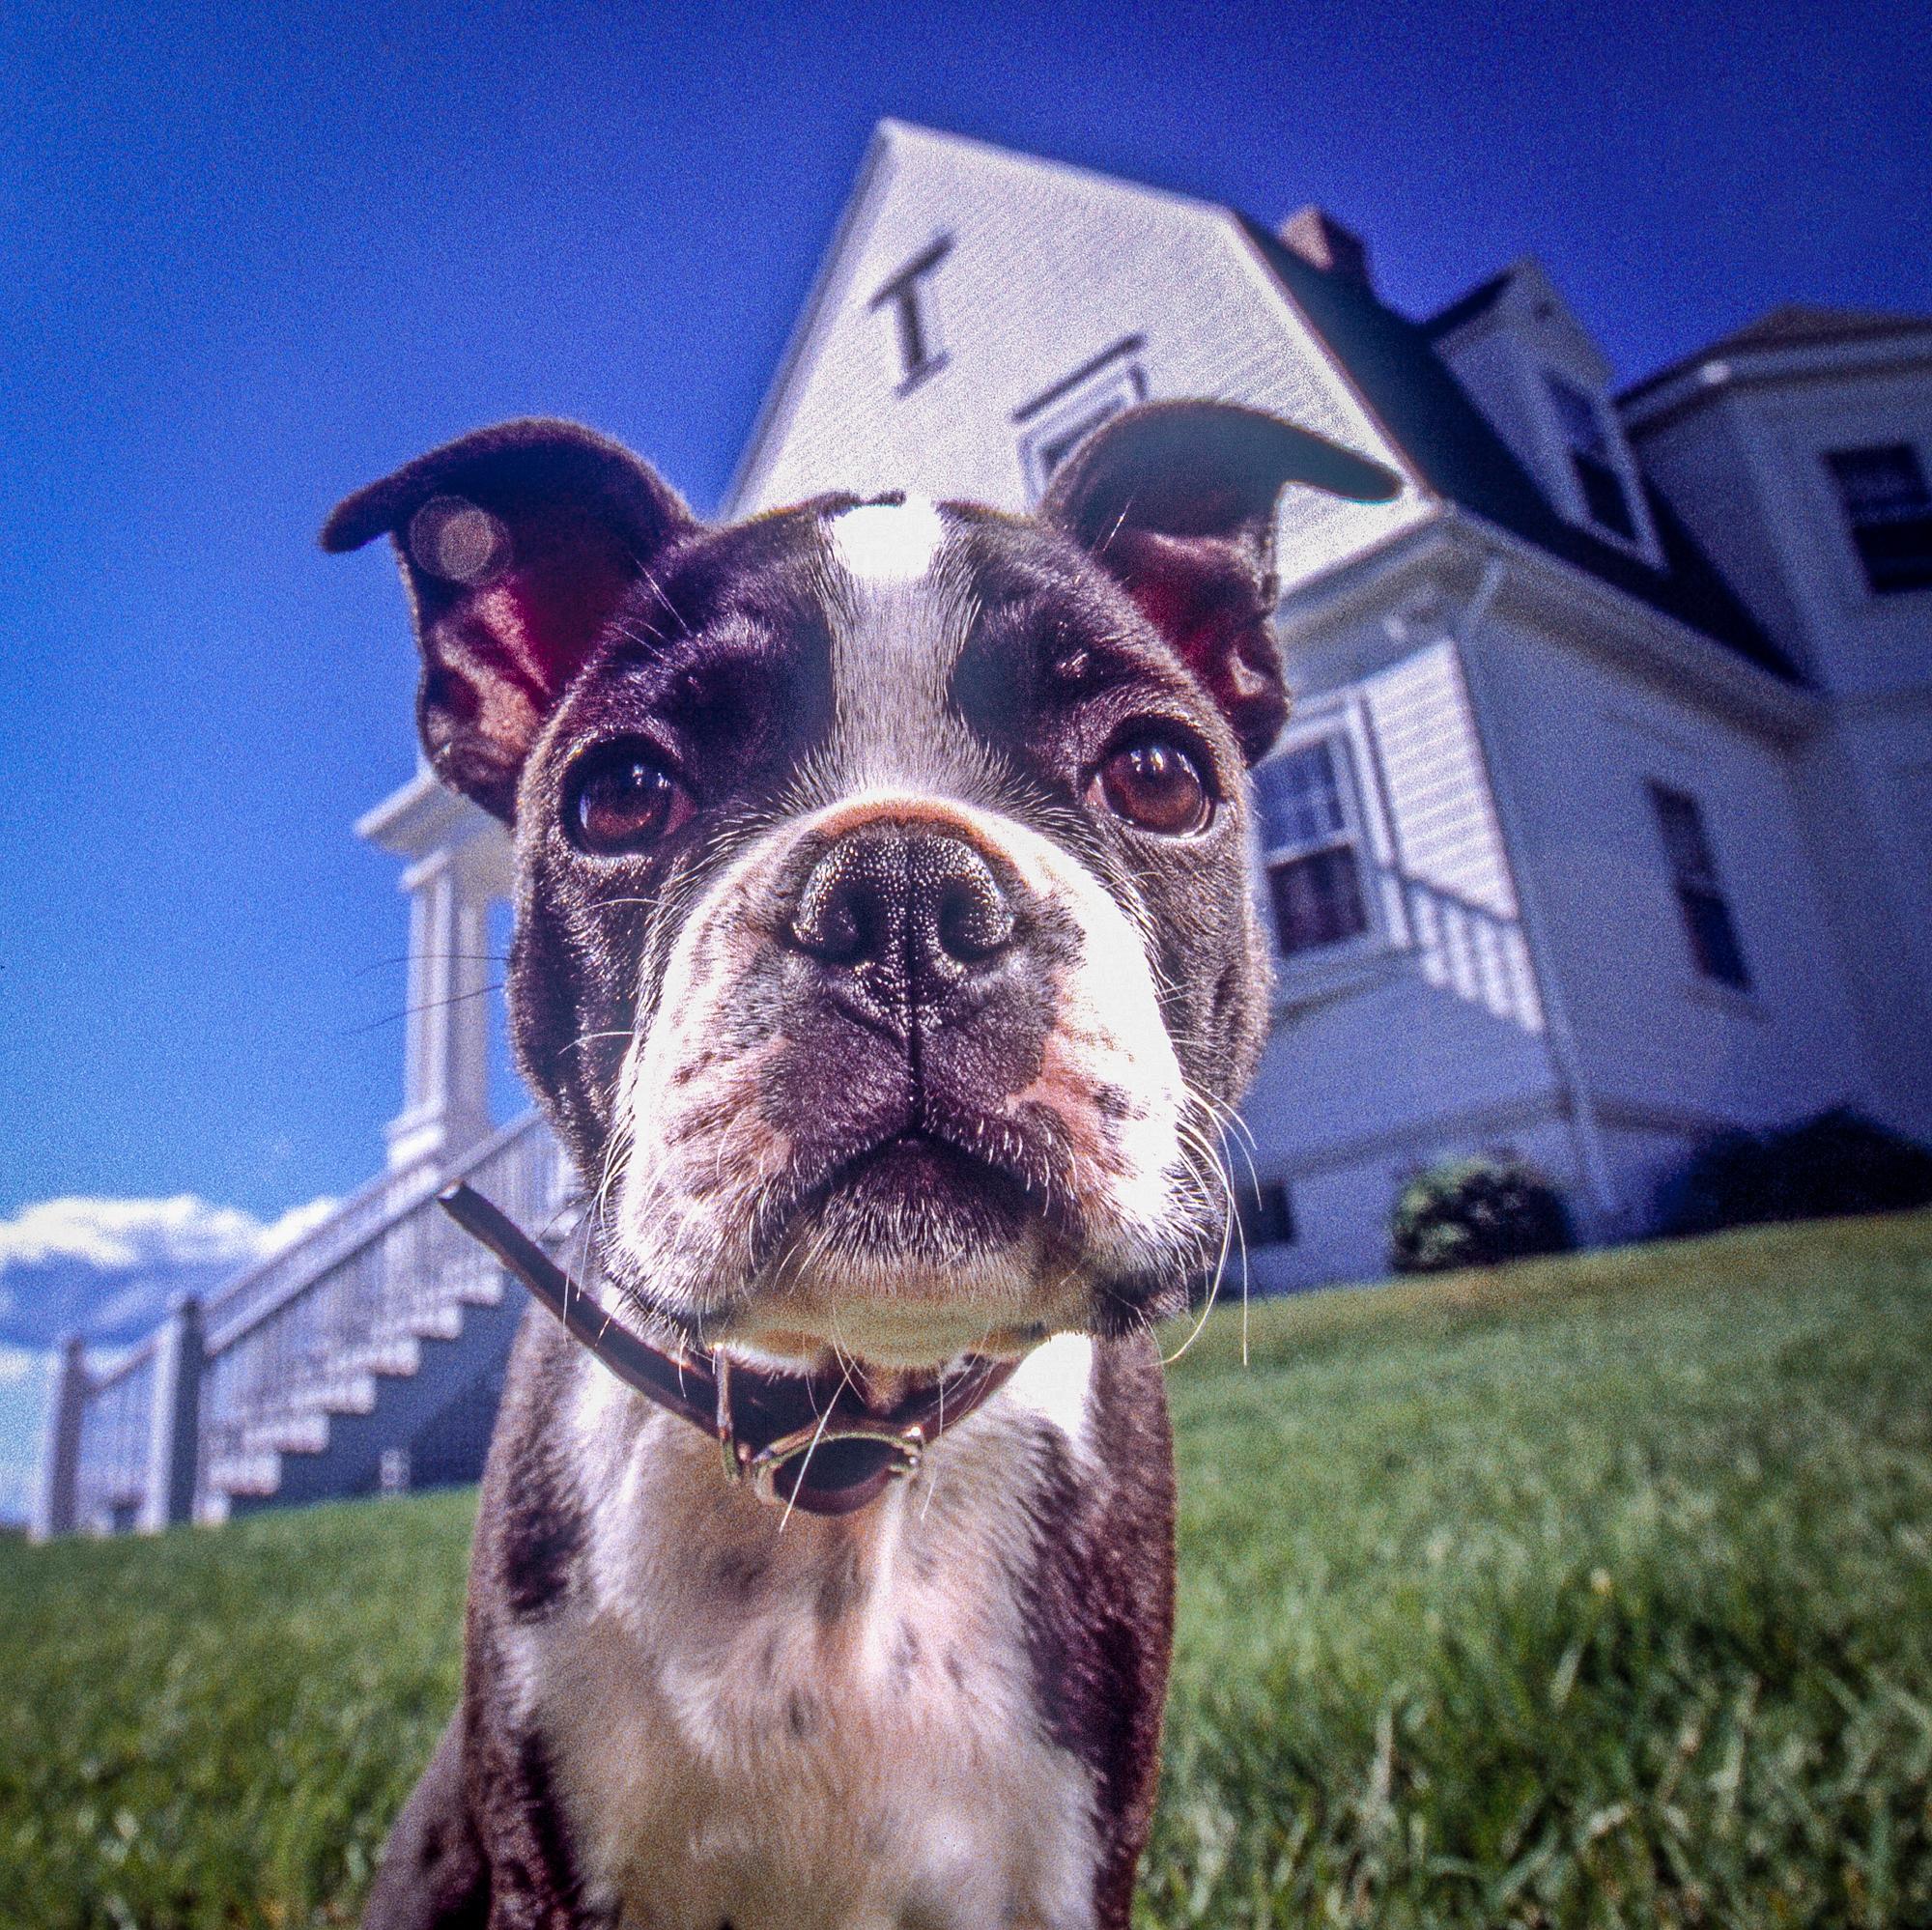 rick-meoli-commercial-photographer-outdoor-animal-lifestyle-repheads-44